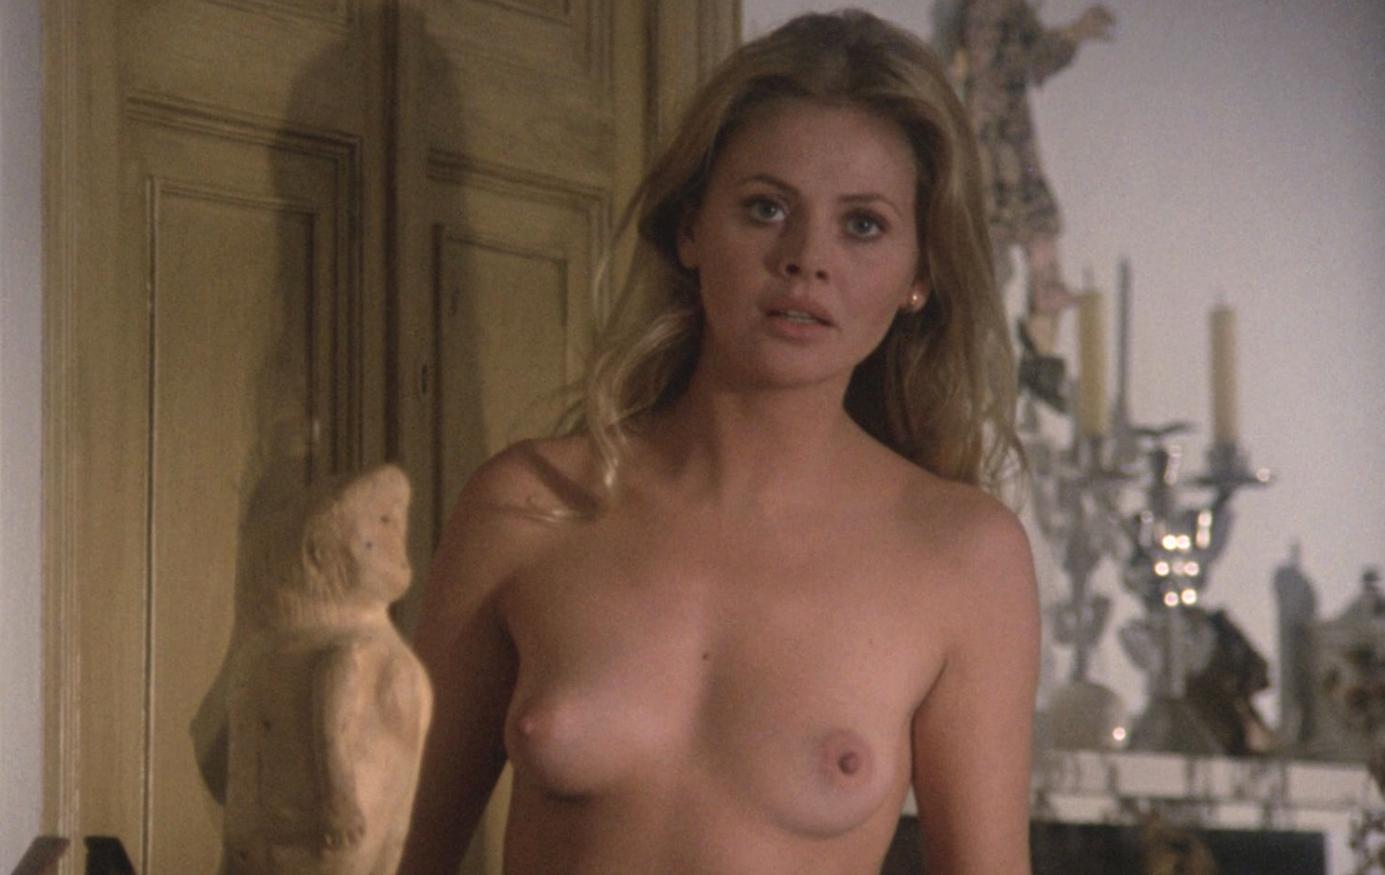 Nudity in horror films